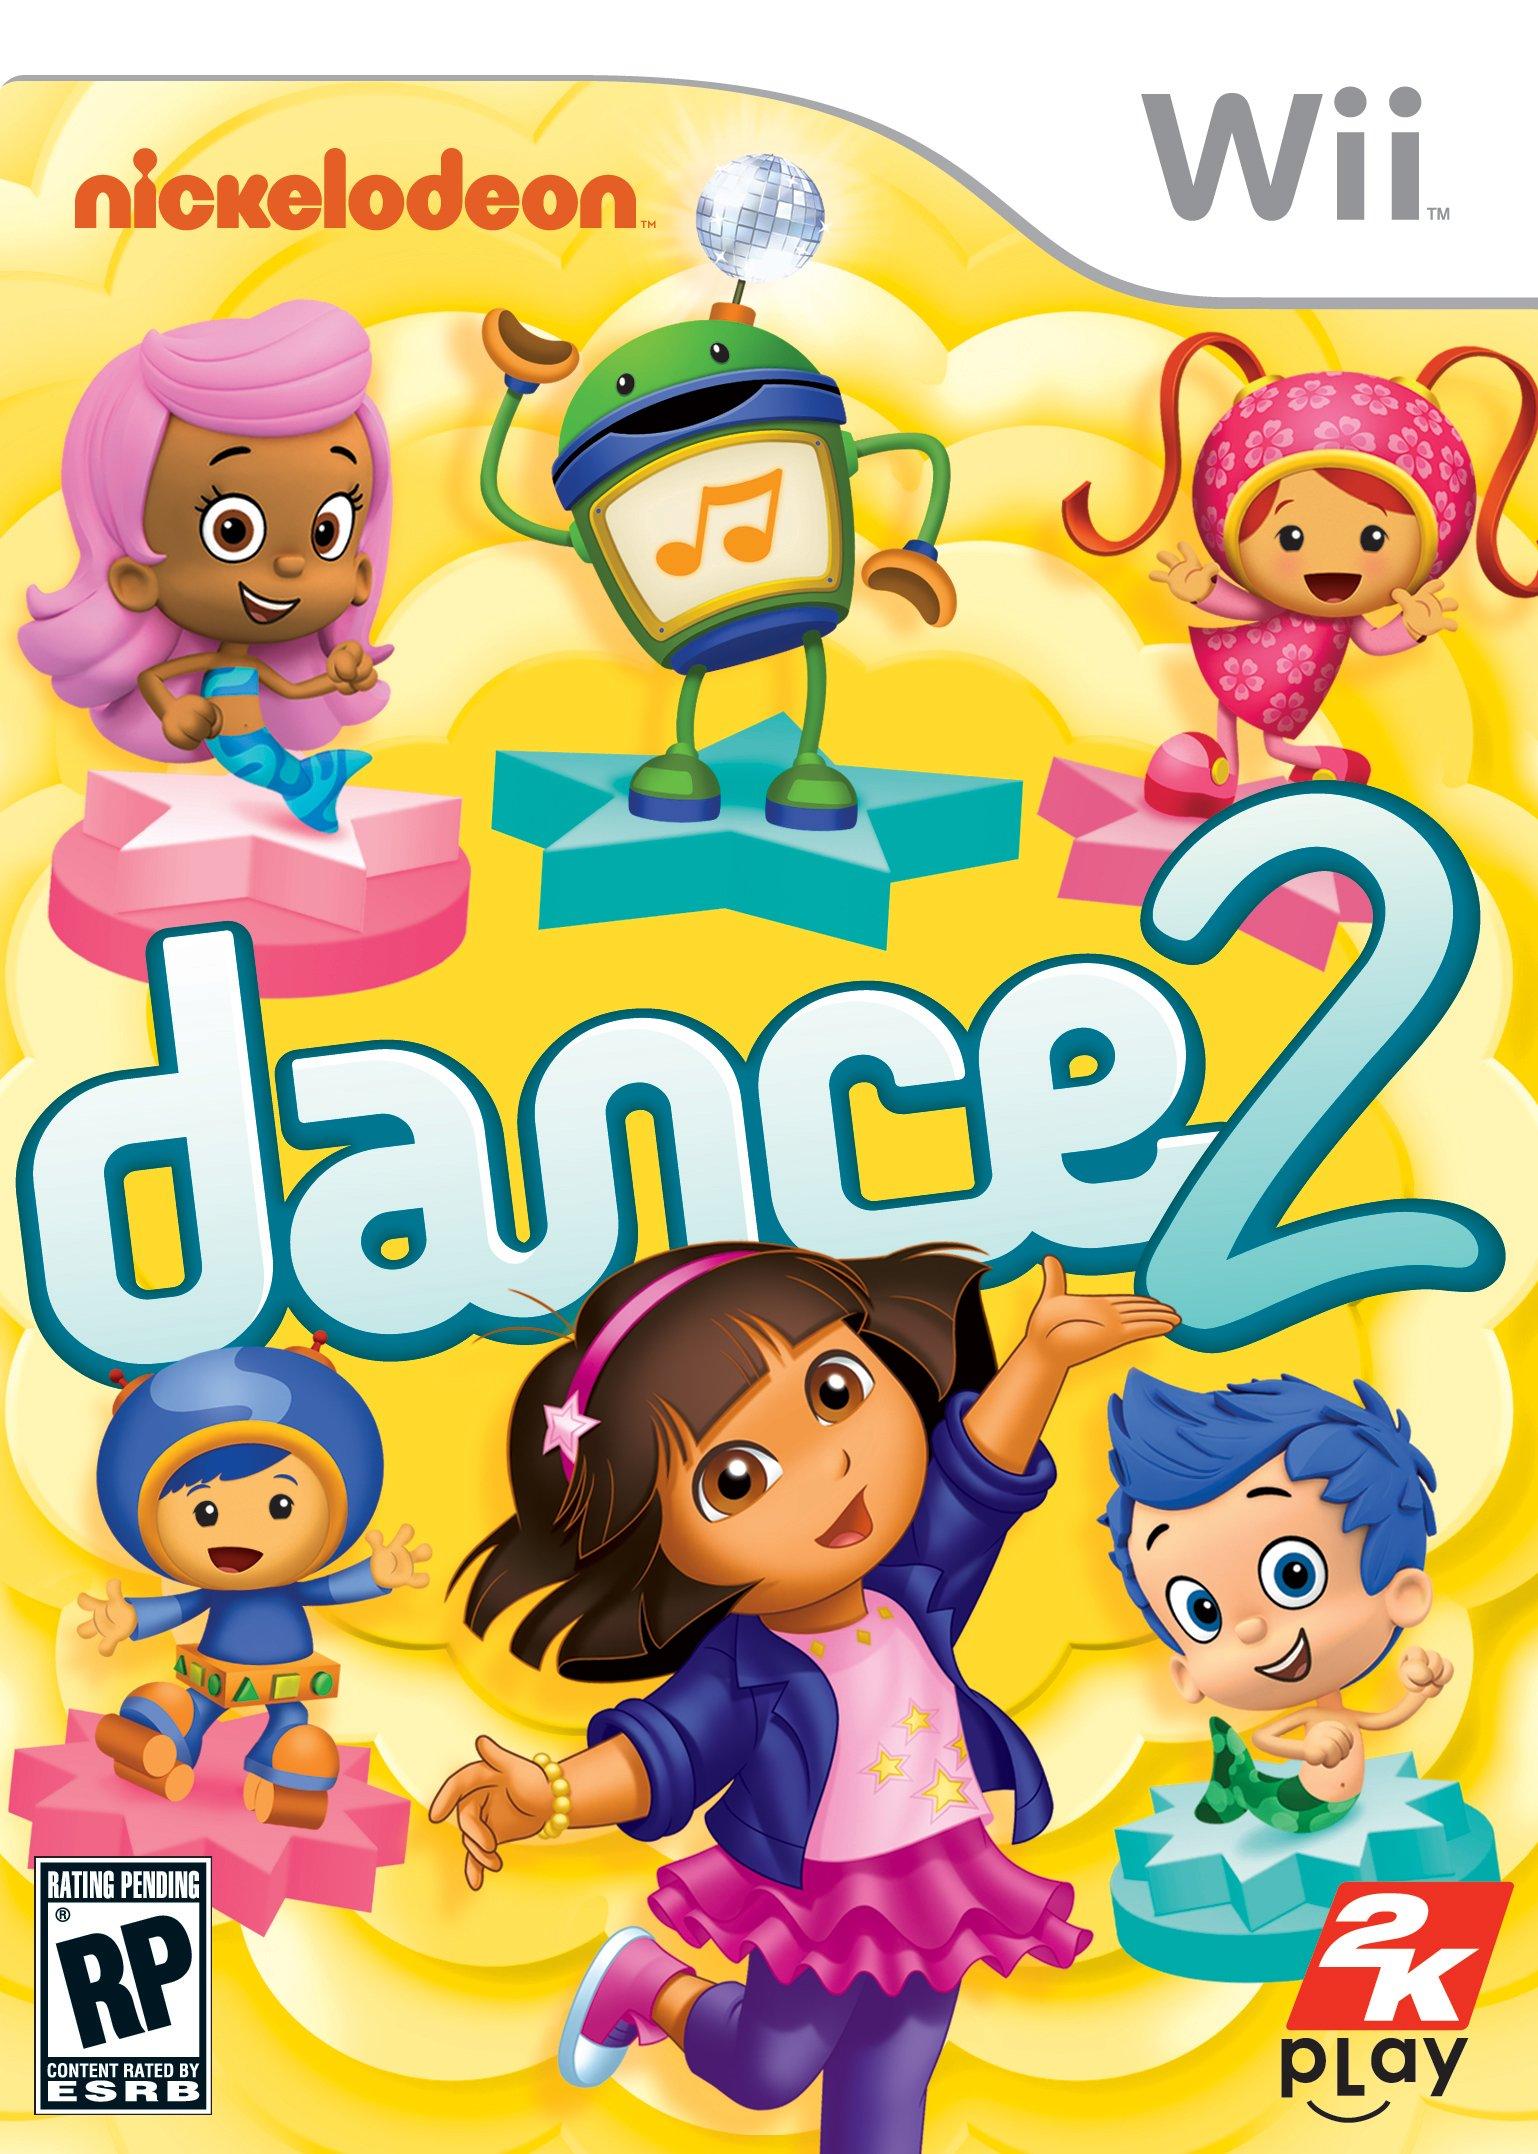 Nickelodeon Dance 2 Release Date Xbox 360 Wii